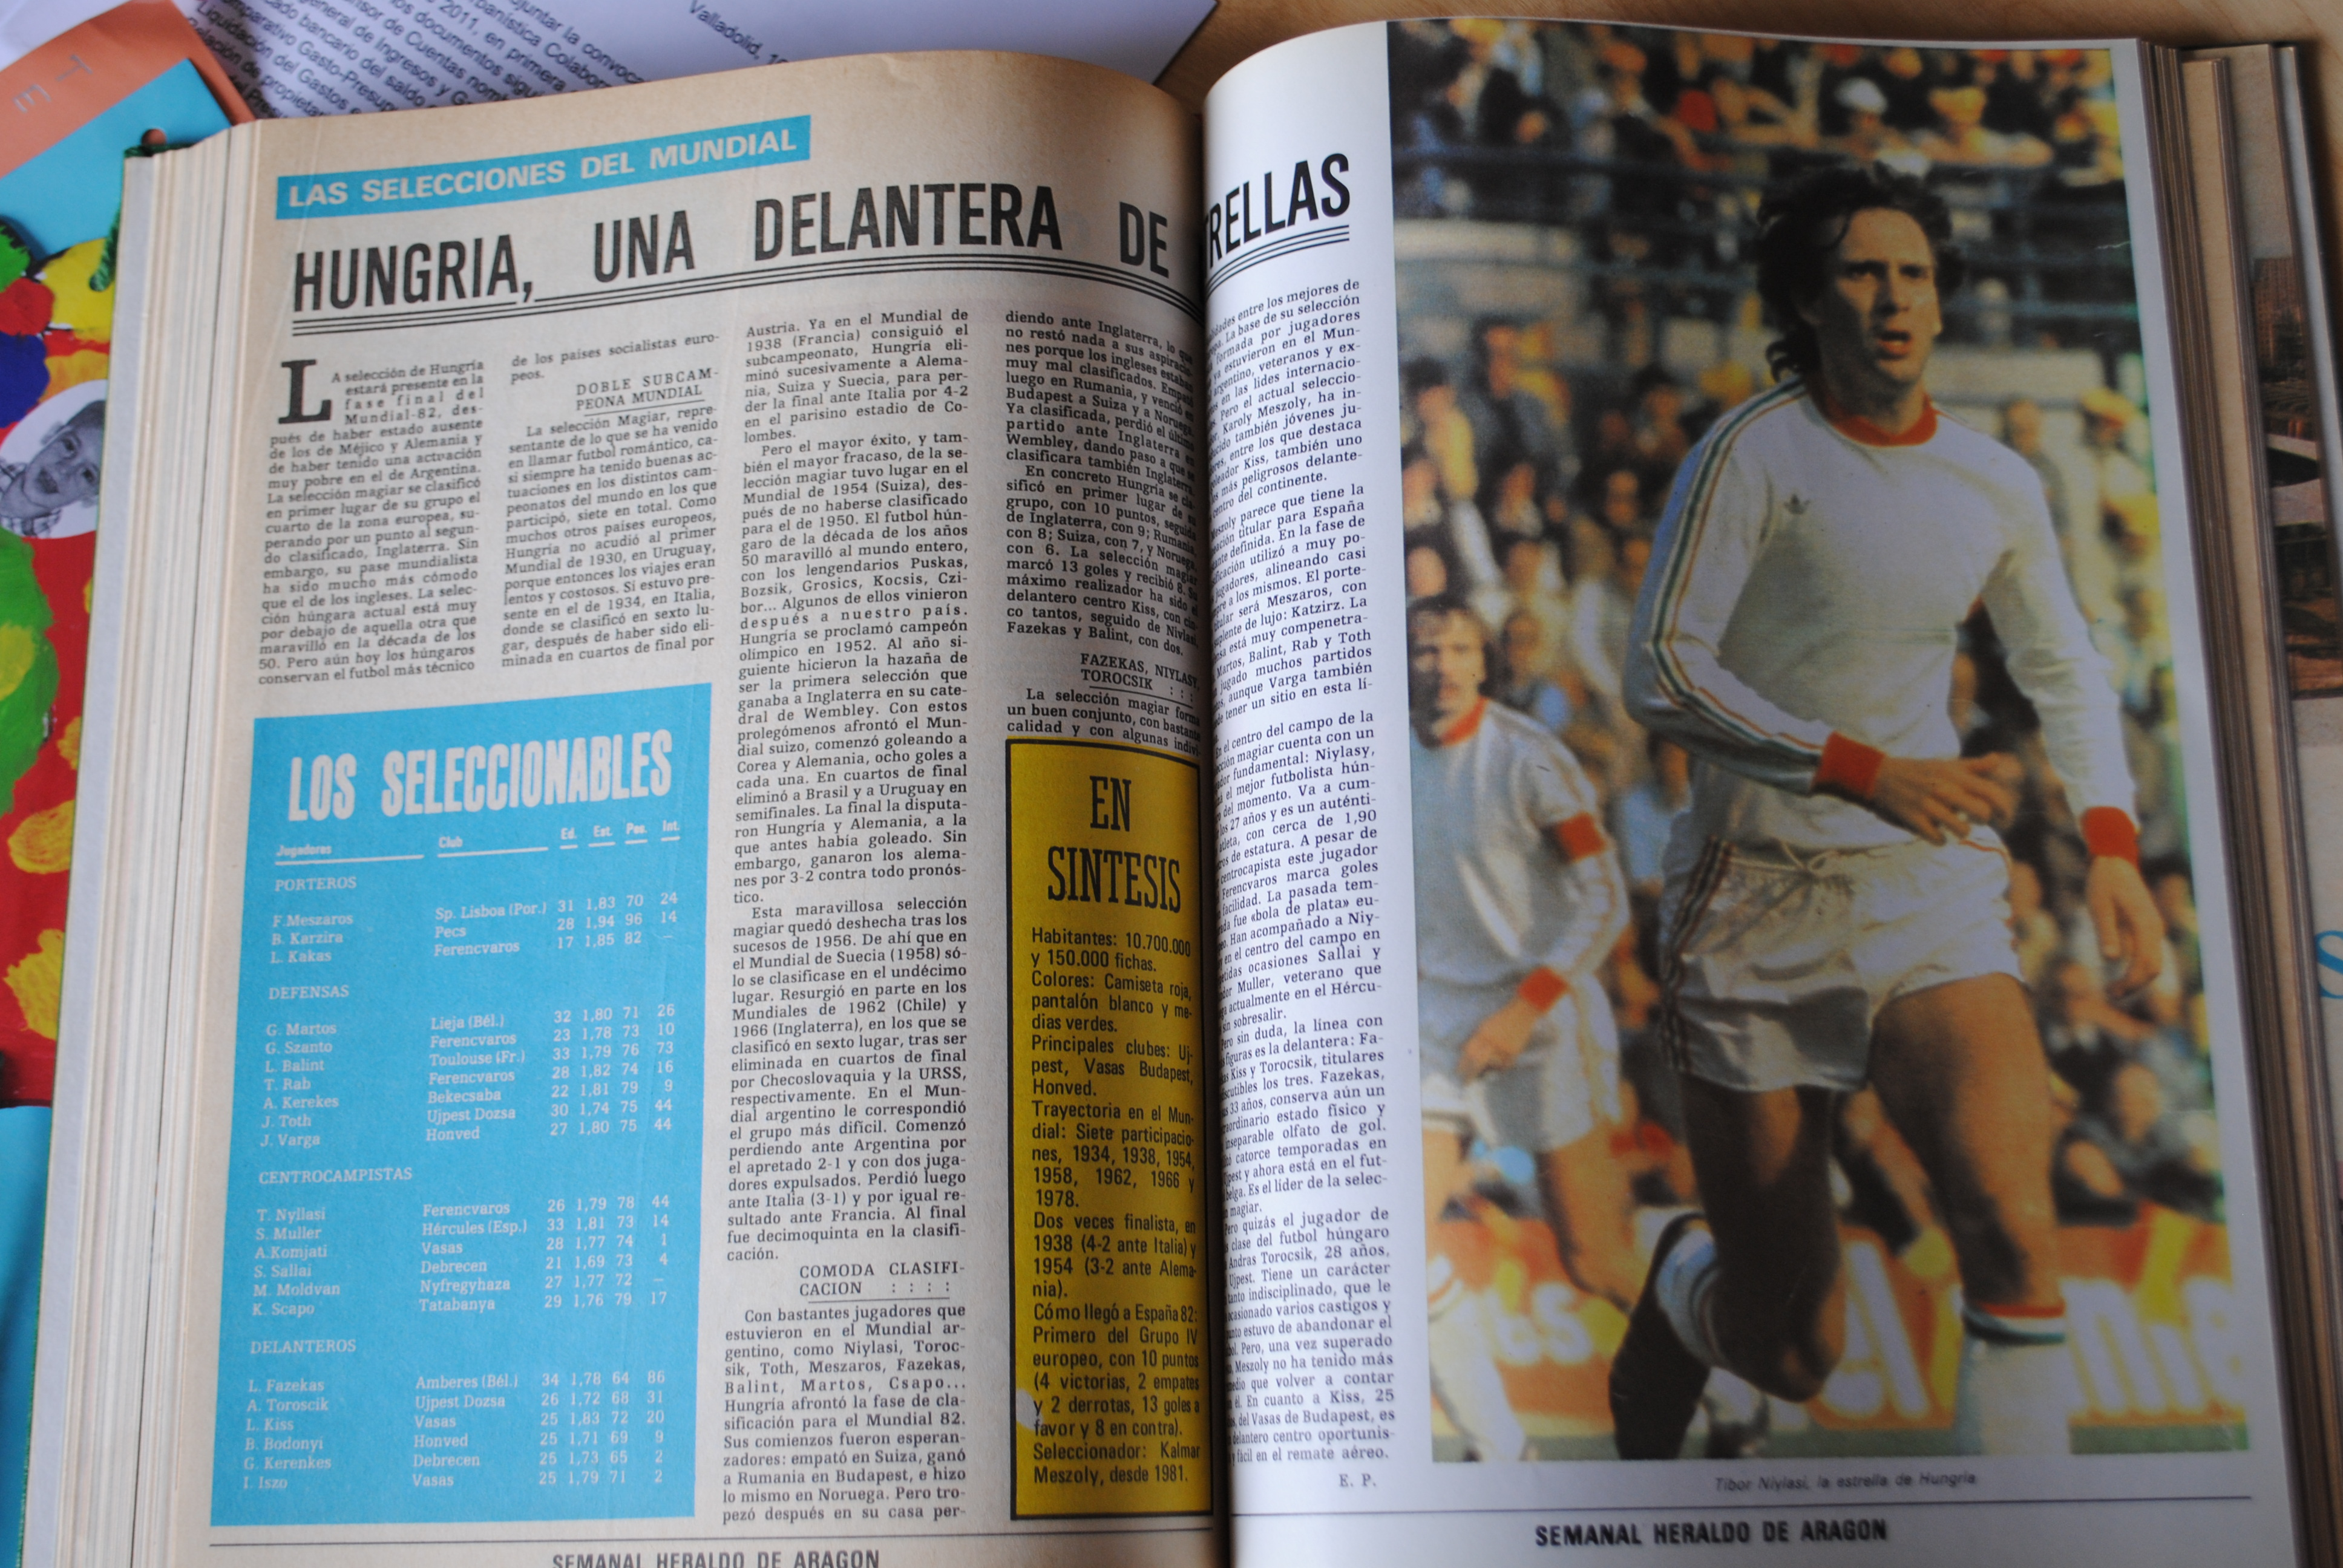 Coleccionismo deportivo: CAMPEONATO MUNDIAL DE FUTBOL 1982. HERALDO DE ARAGON. COMPLETO!!!!!!!!!! MUNDIAL 82 - Foto 4 - 27249749